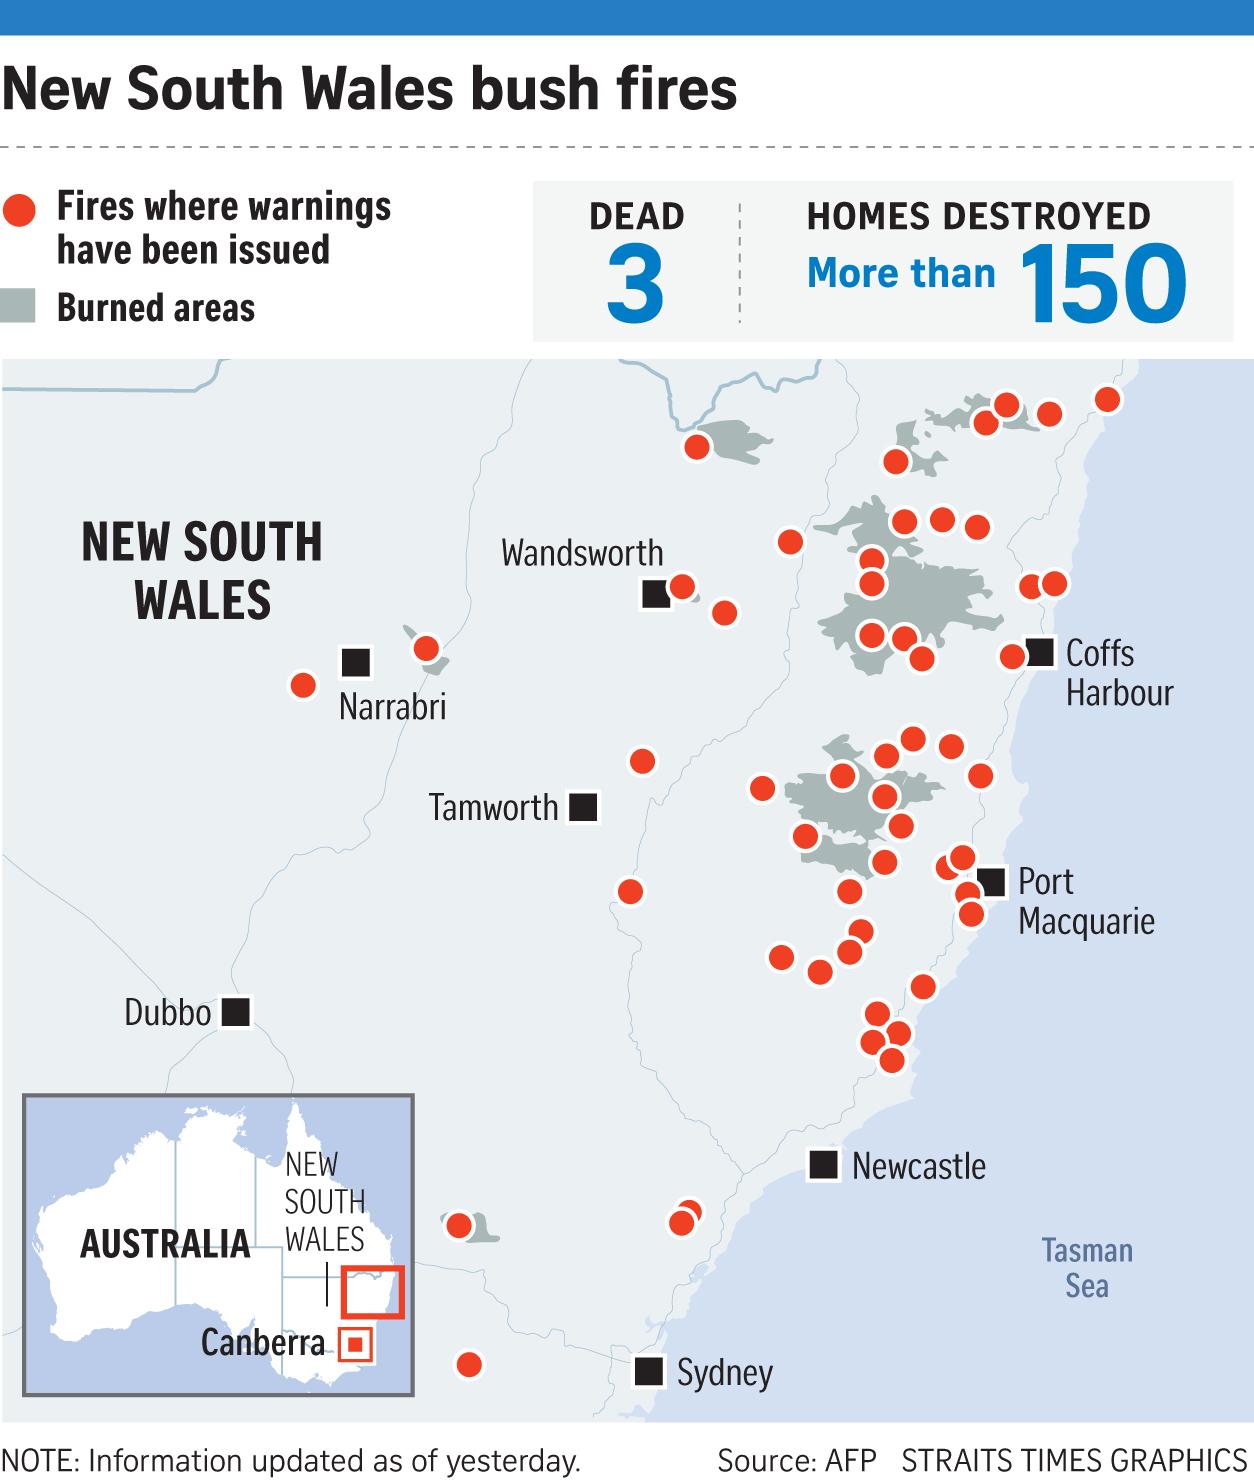 Sydney Declares Emergency as 'Catastrophic' Bush Fires Loom